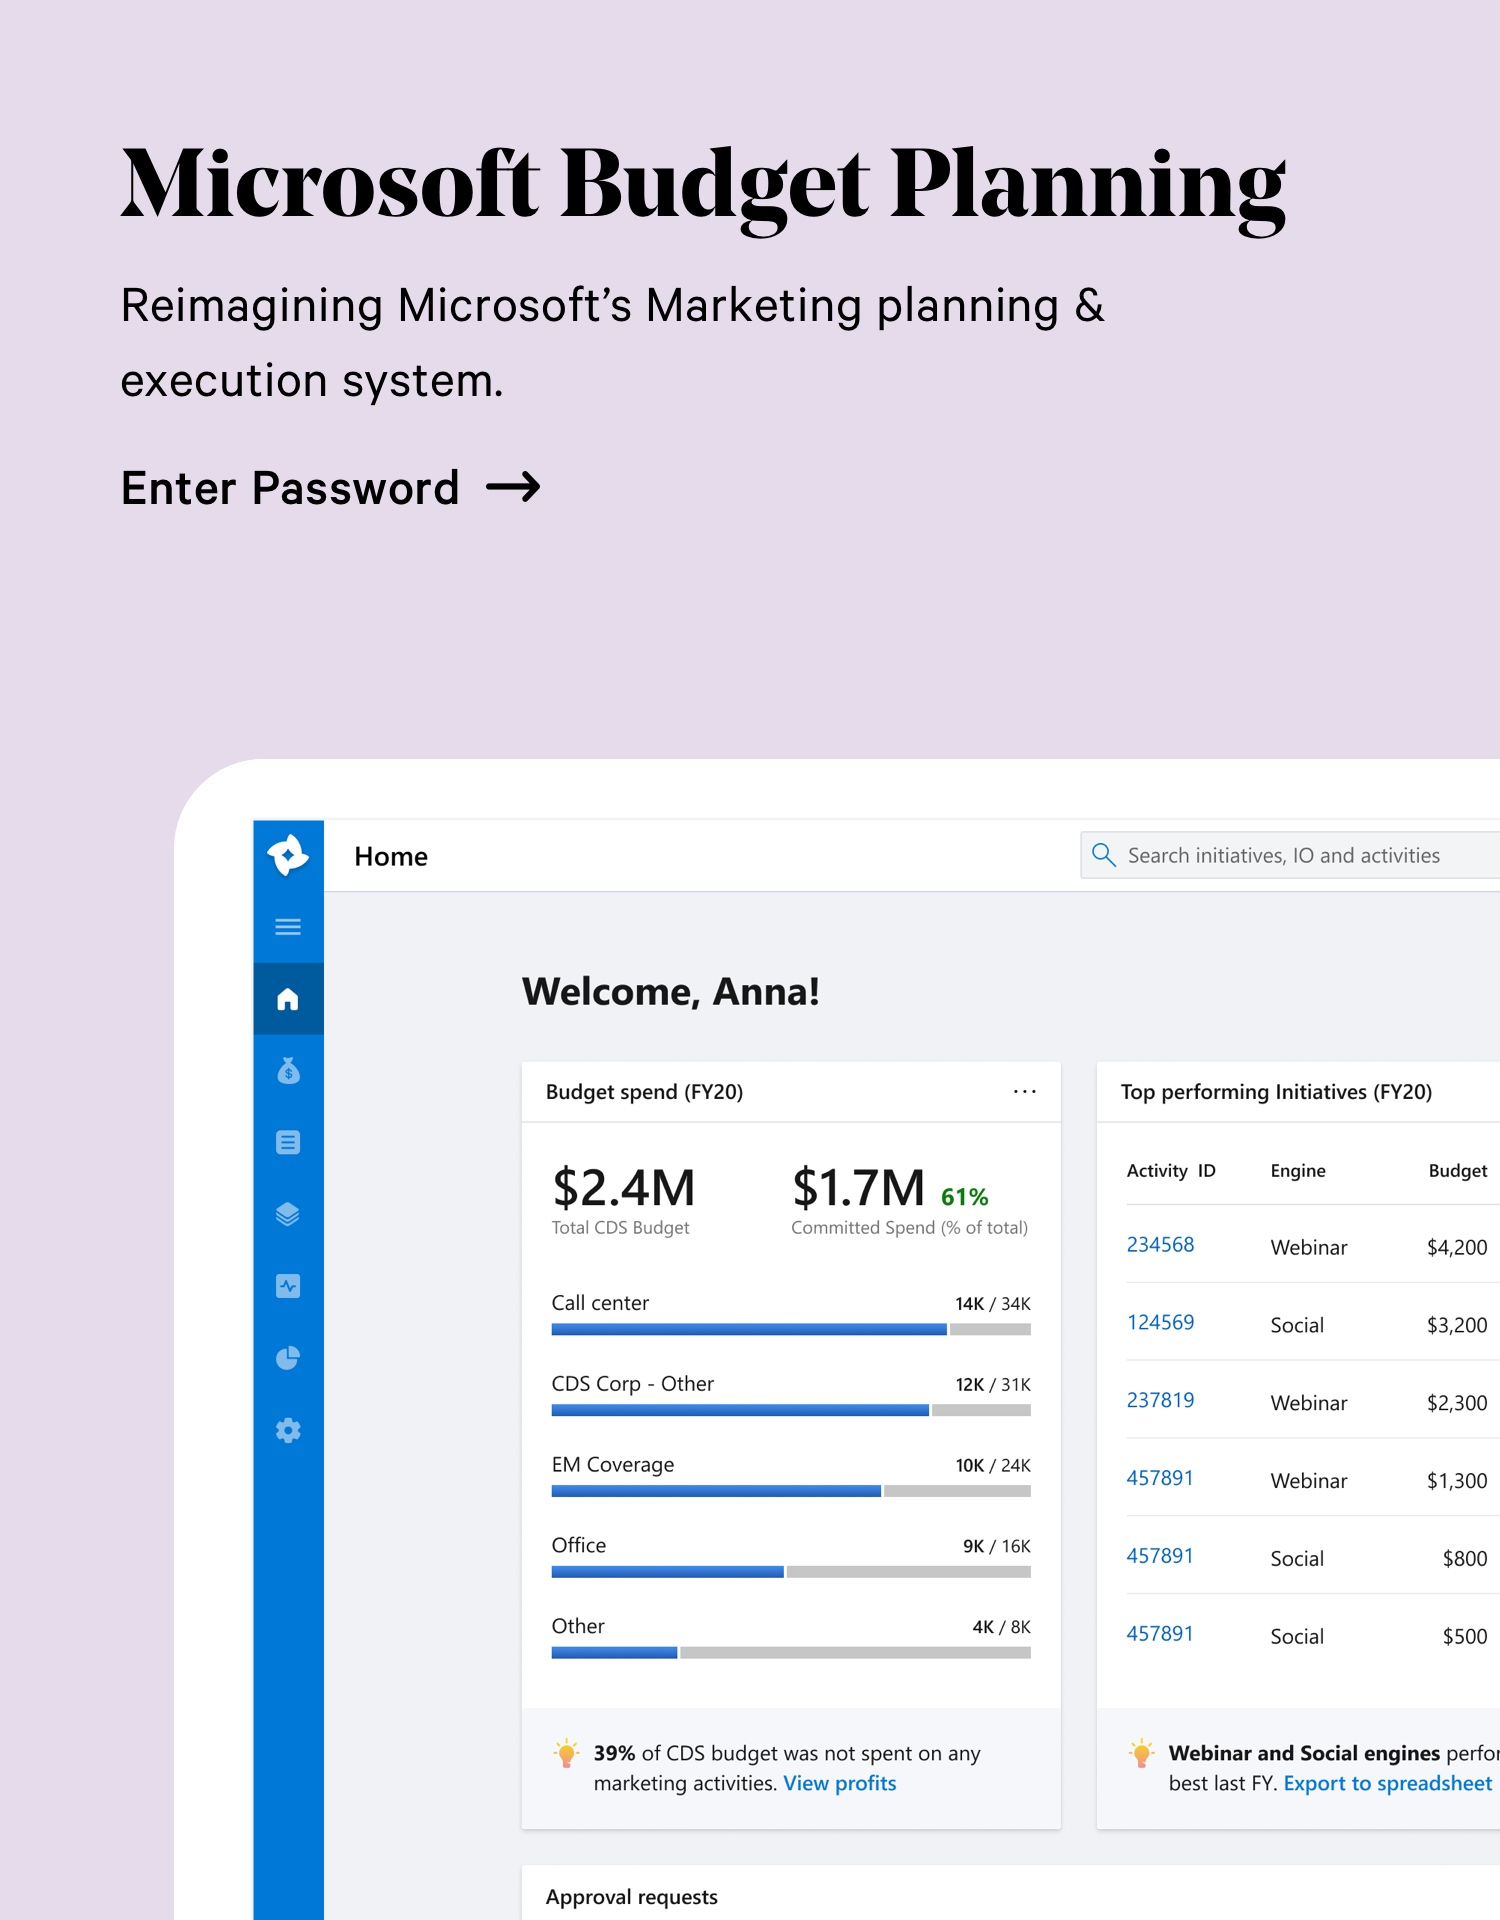 Microsoft Budget Planning